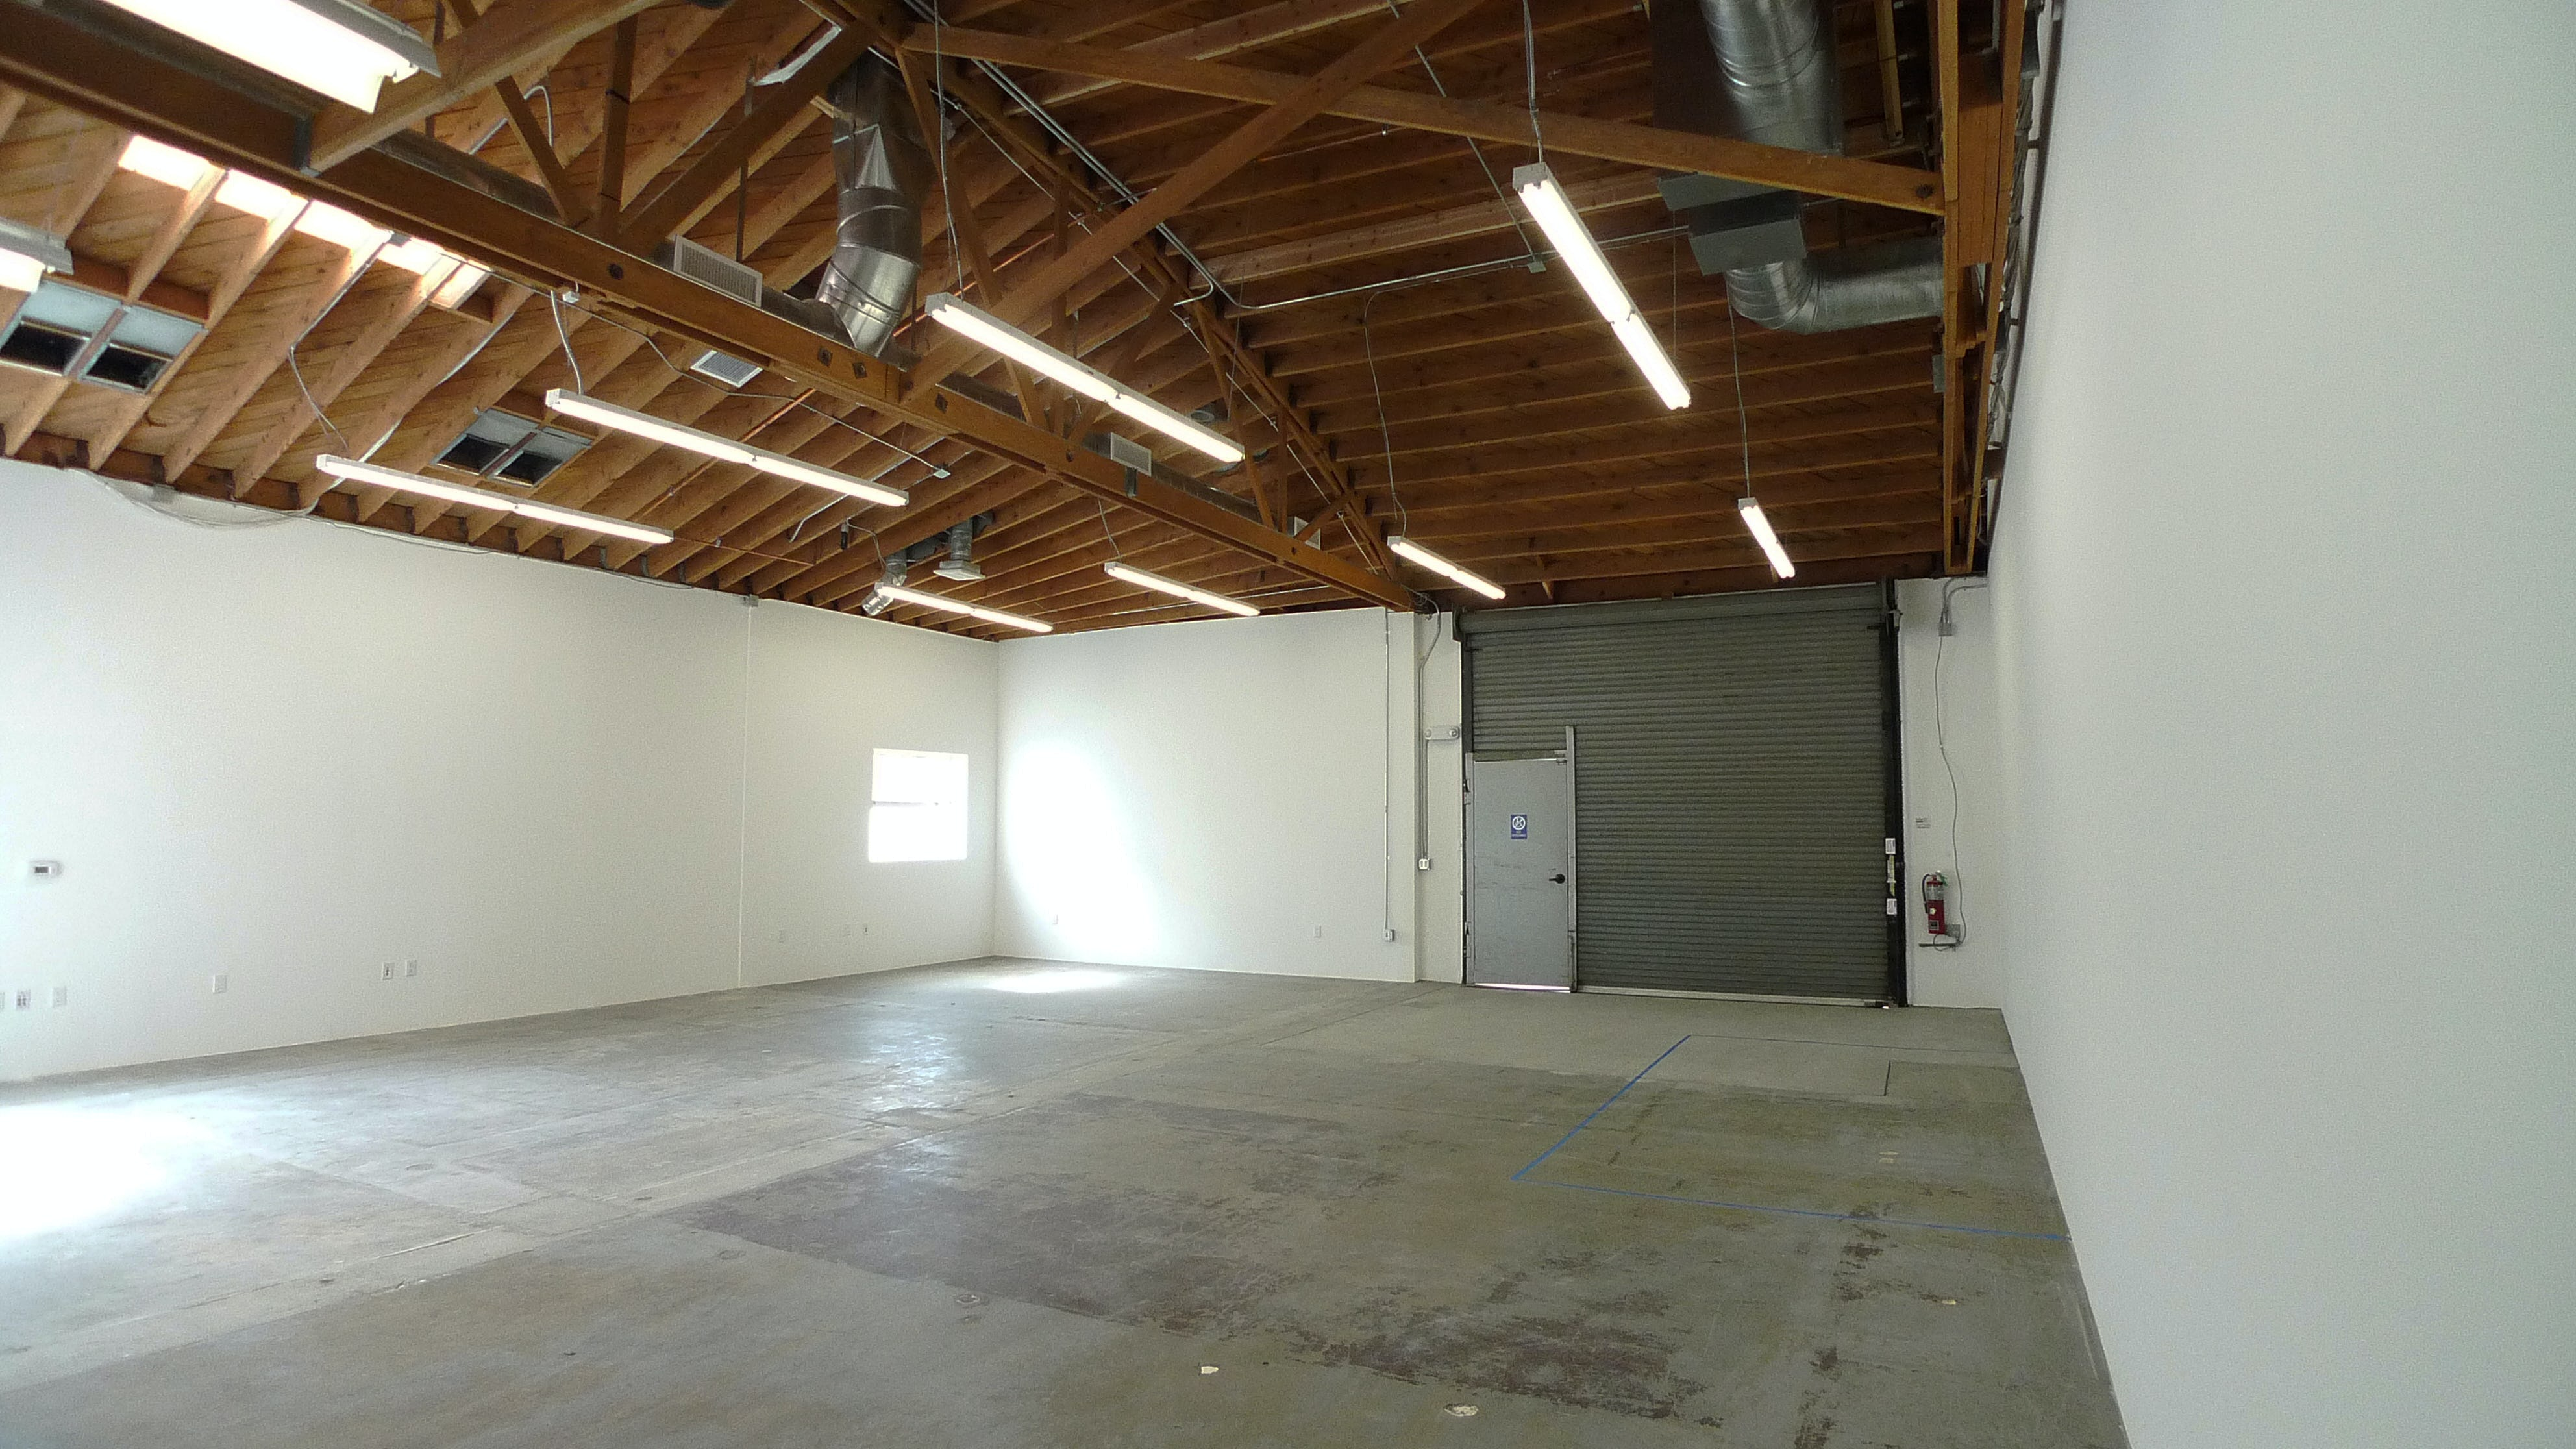 Fer smashbox studio interior studio